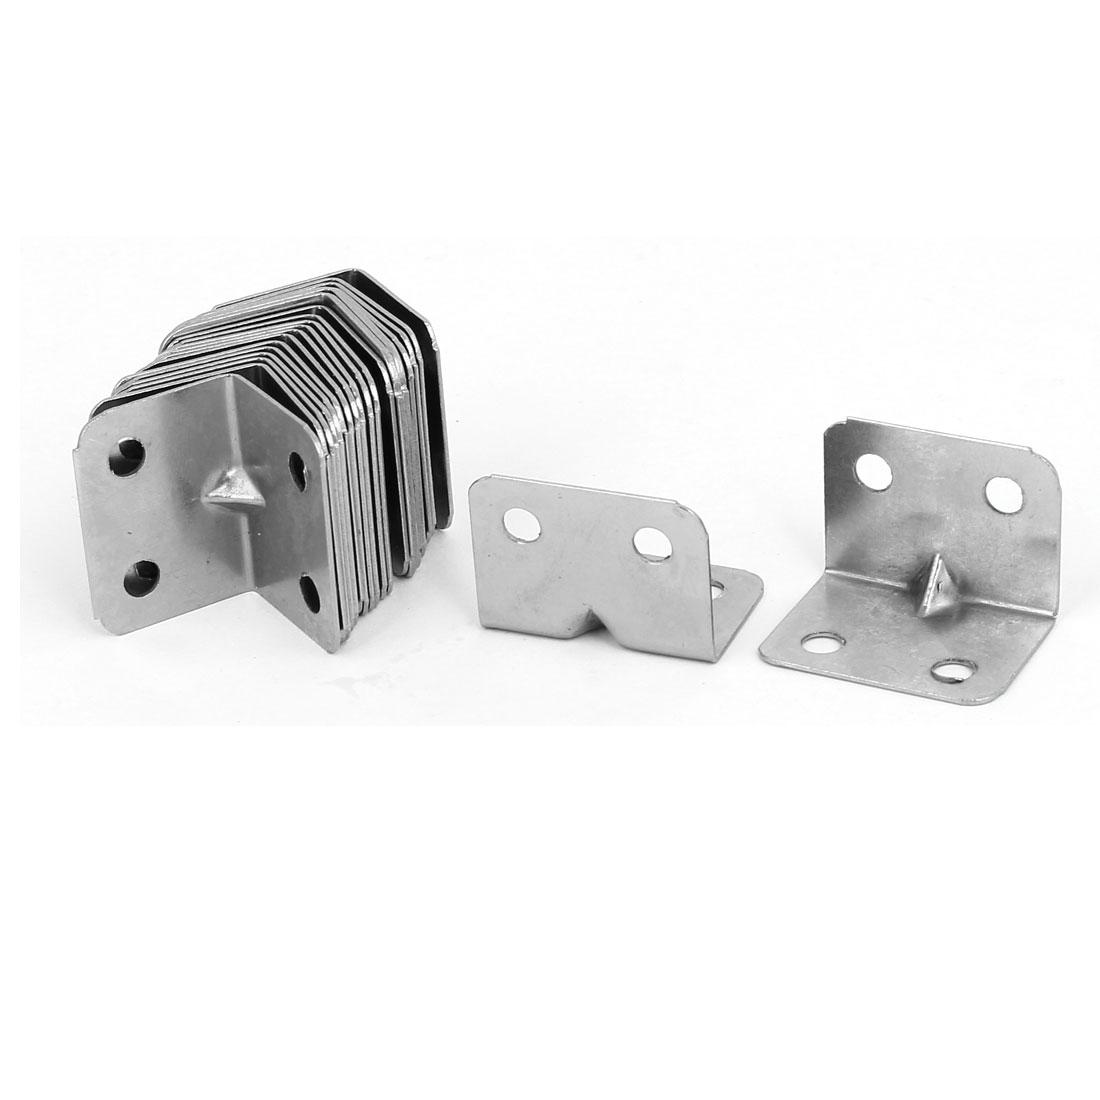 25mmx25mmx32mm Stainless Steel 90 Degree Angle Brackets Corner Braces 20pcs